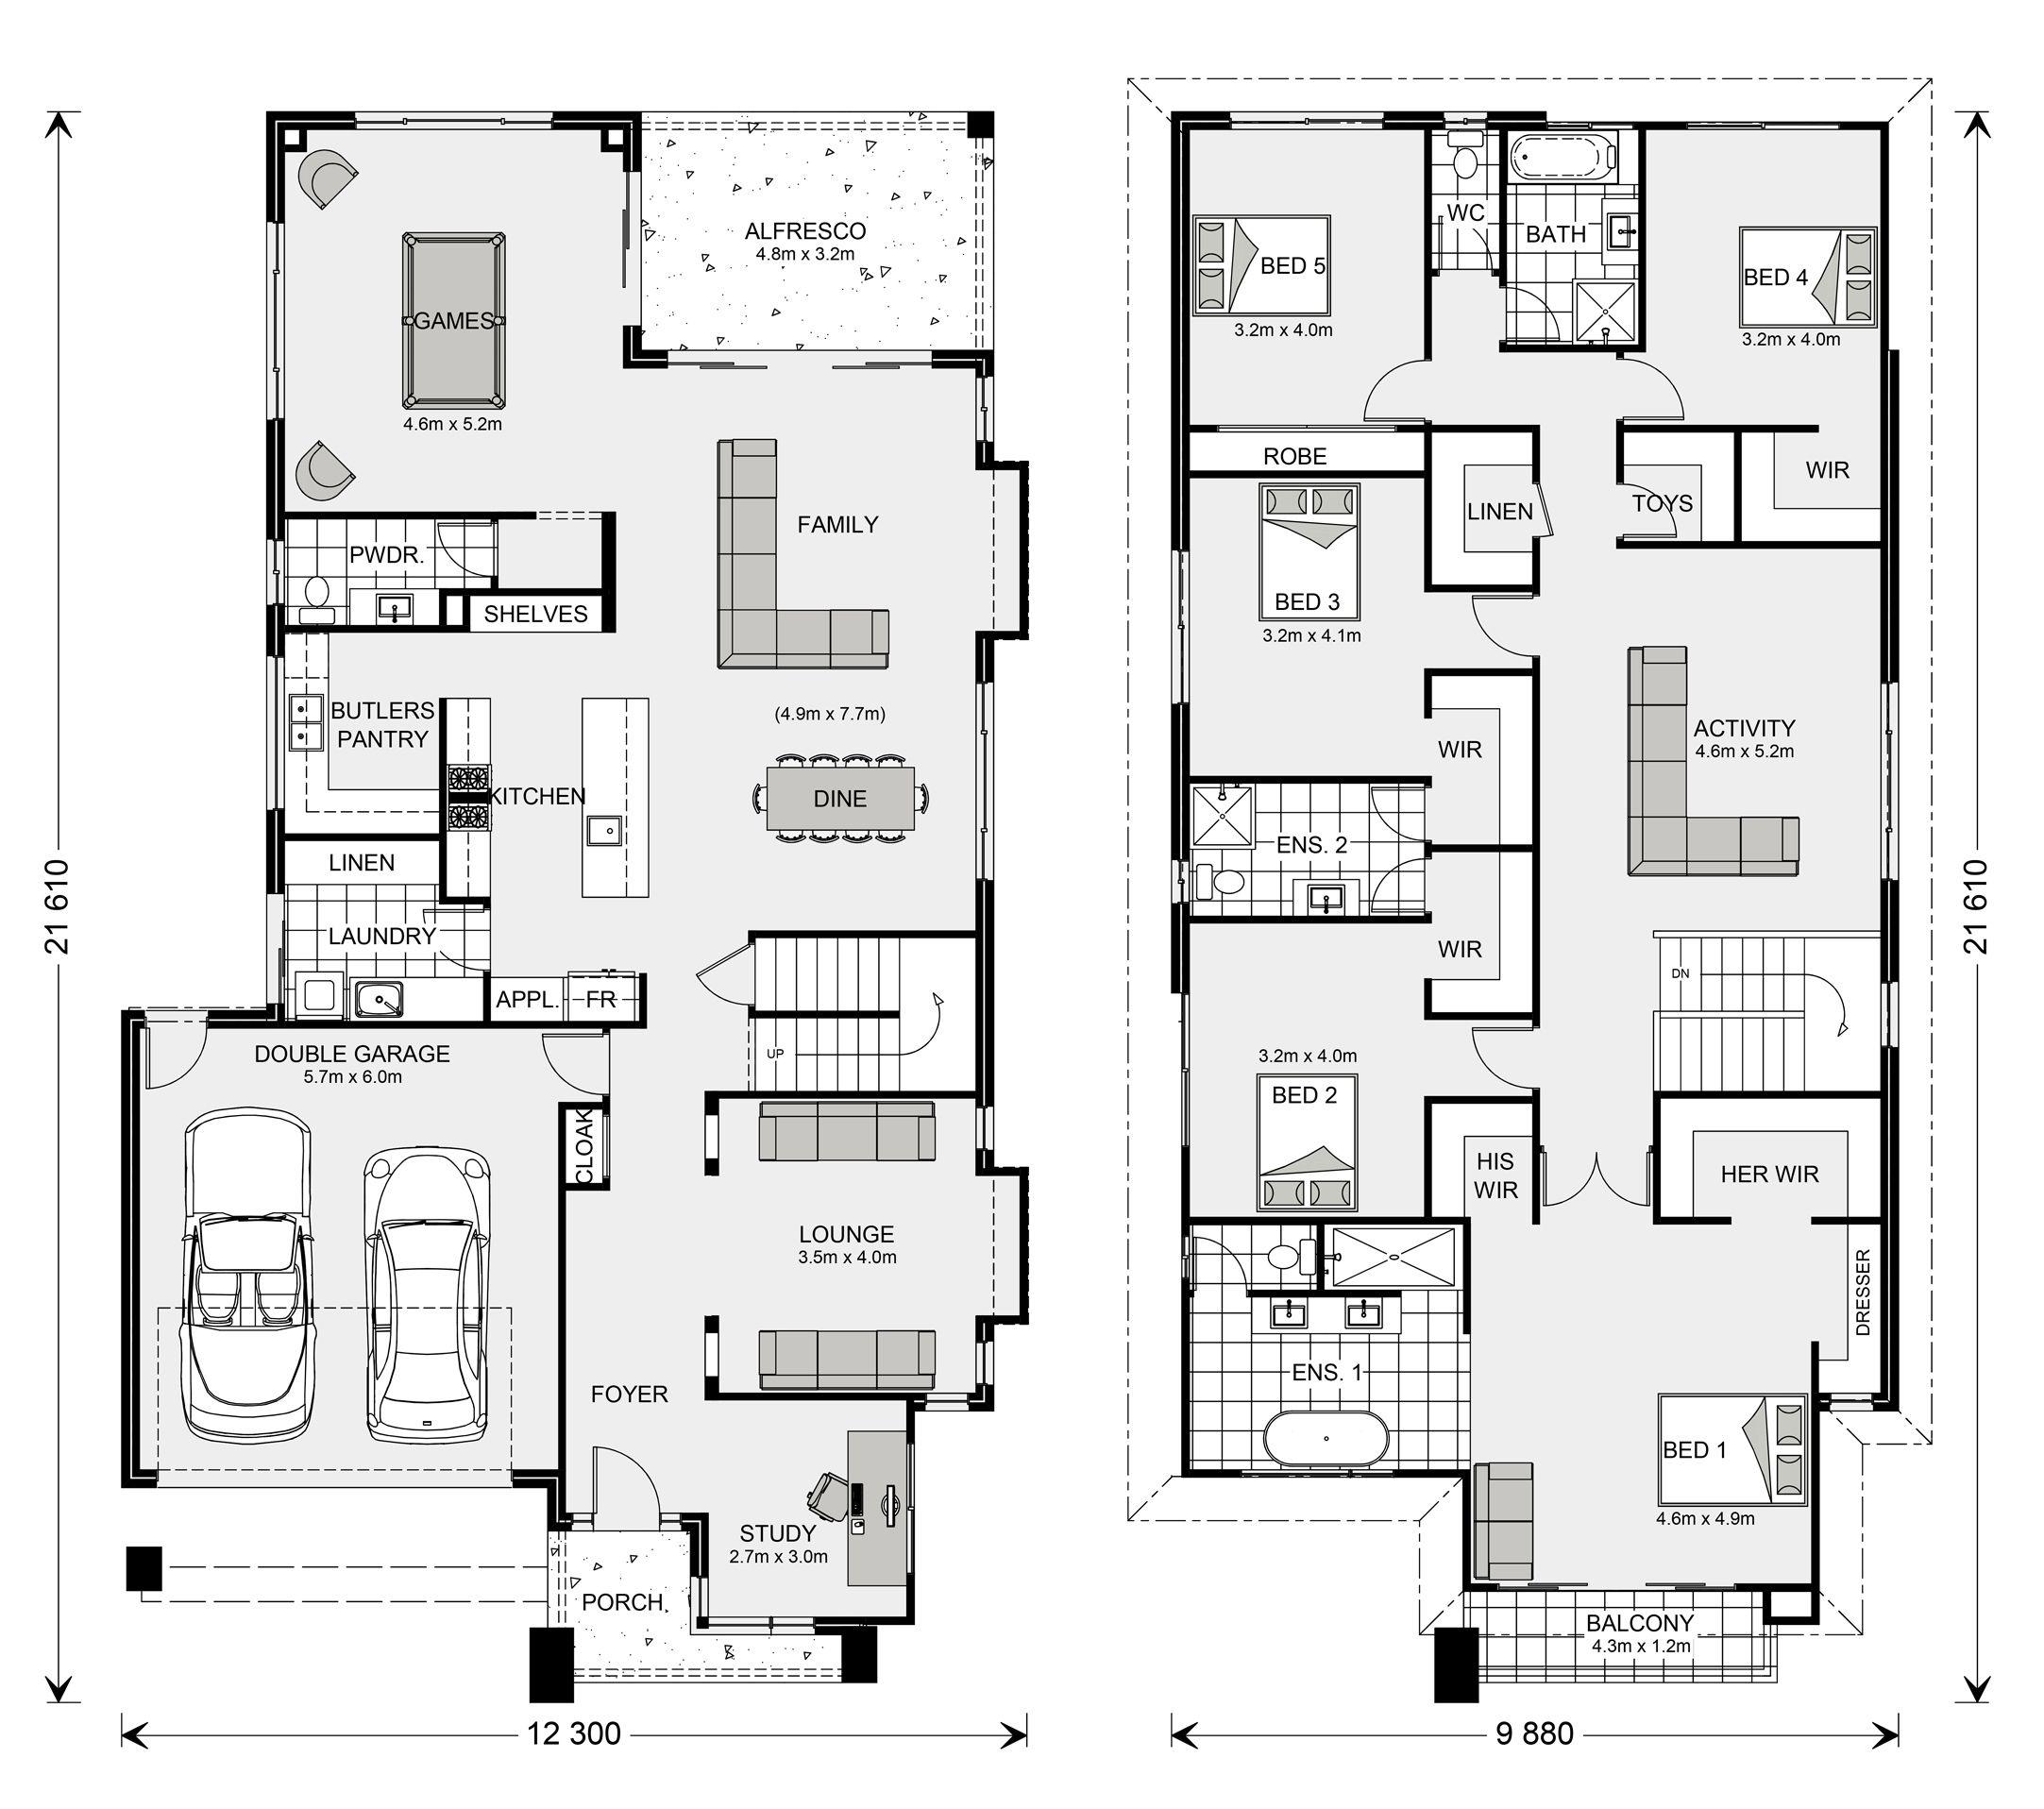 Elwood 406, Home Designs in Newcastle G.J. Gardner Homes